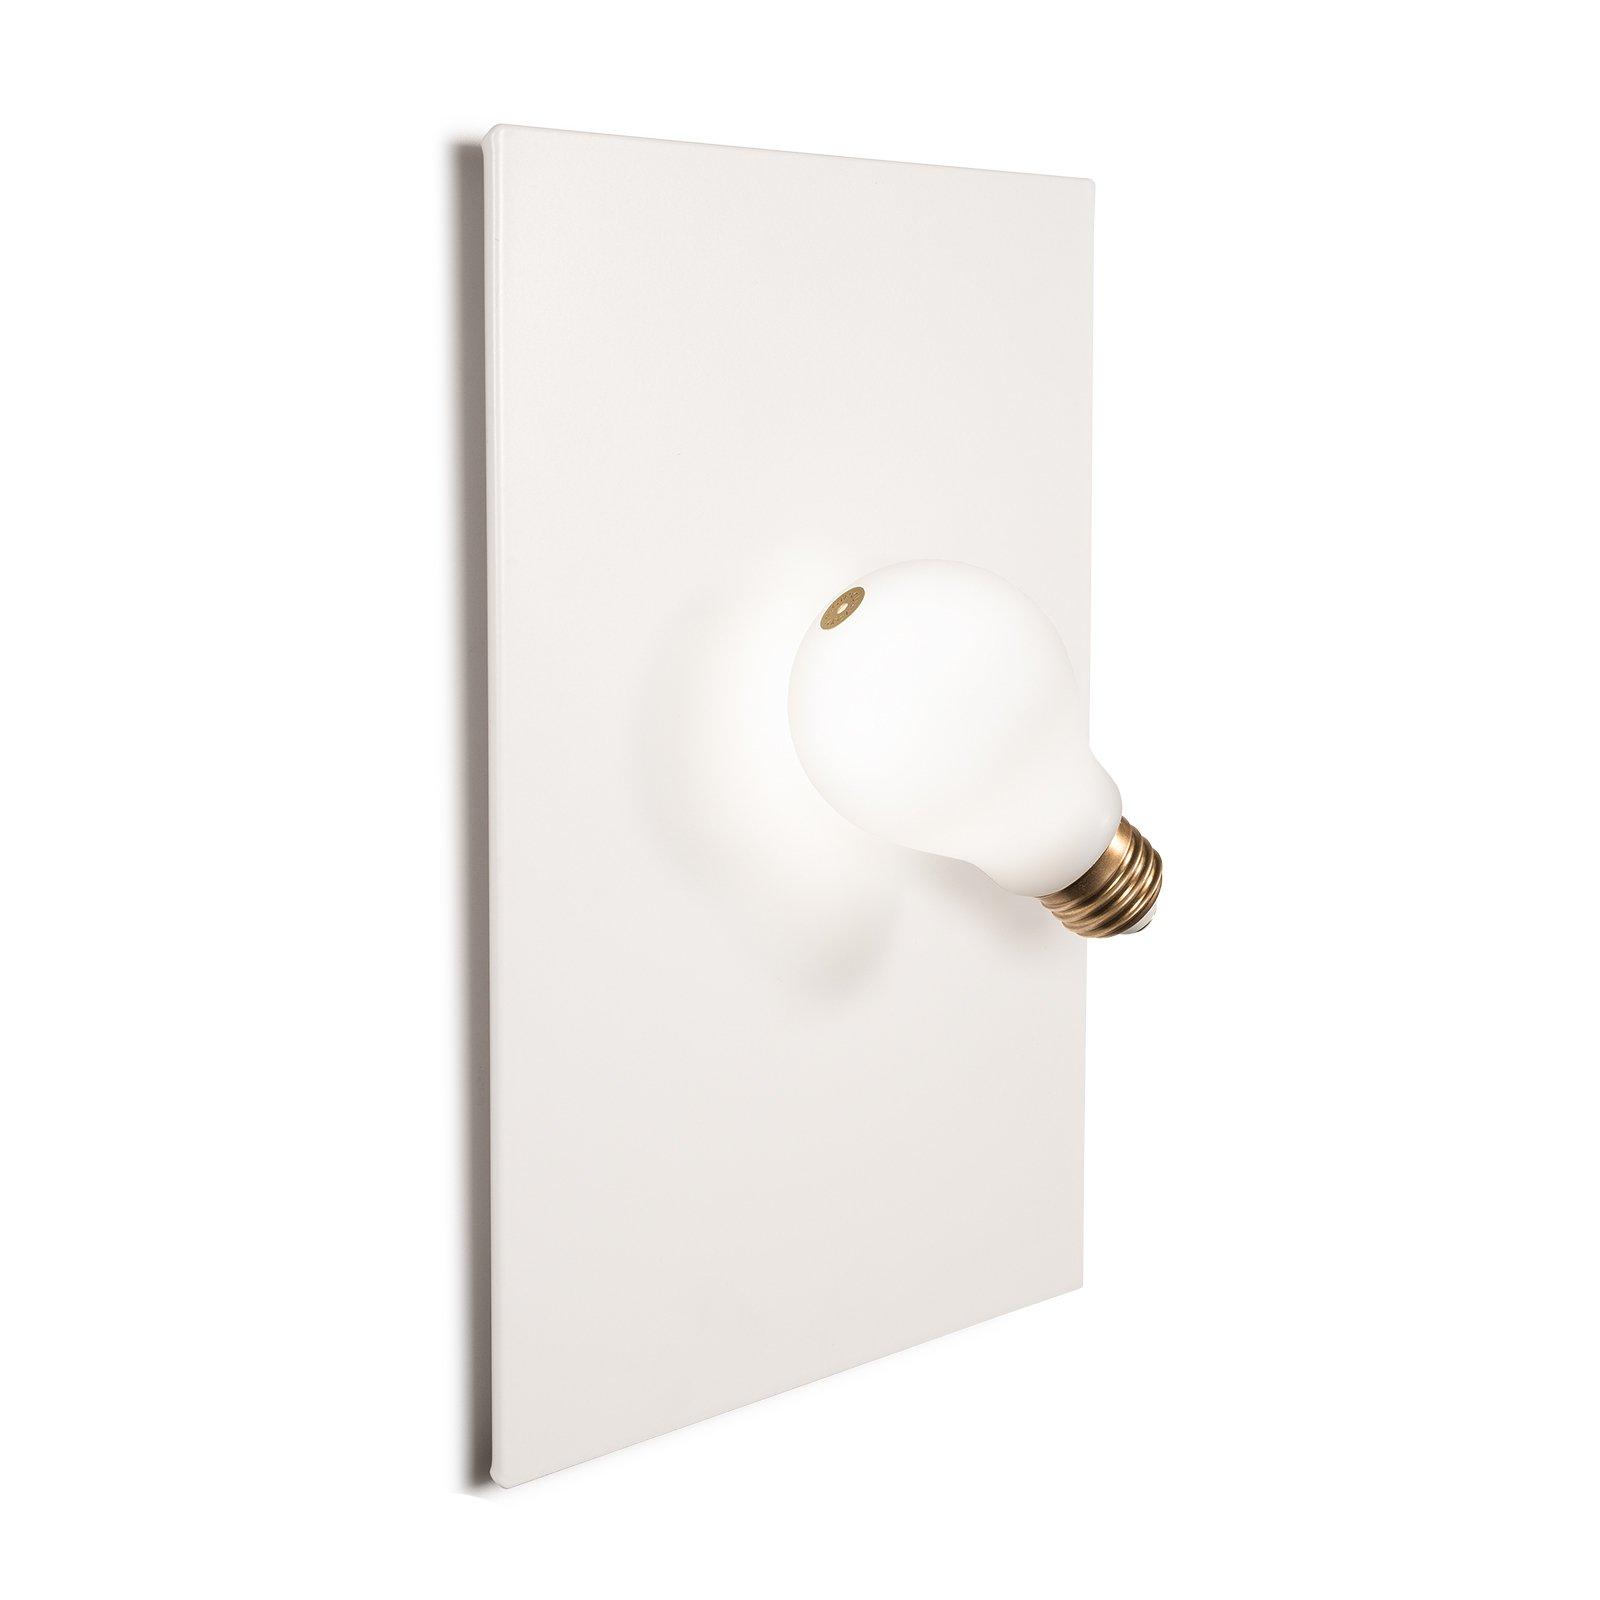 Slamp Idea LED-vegglampe, hvit